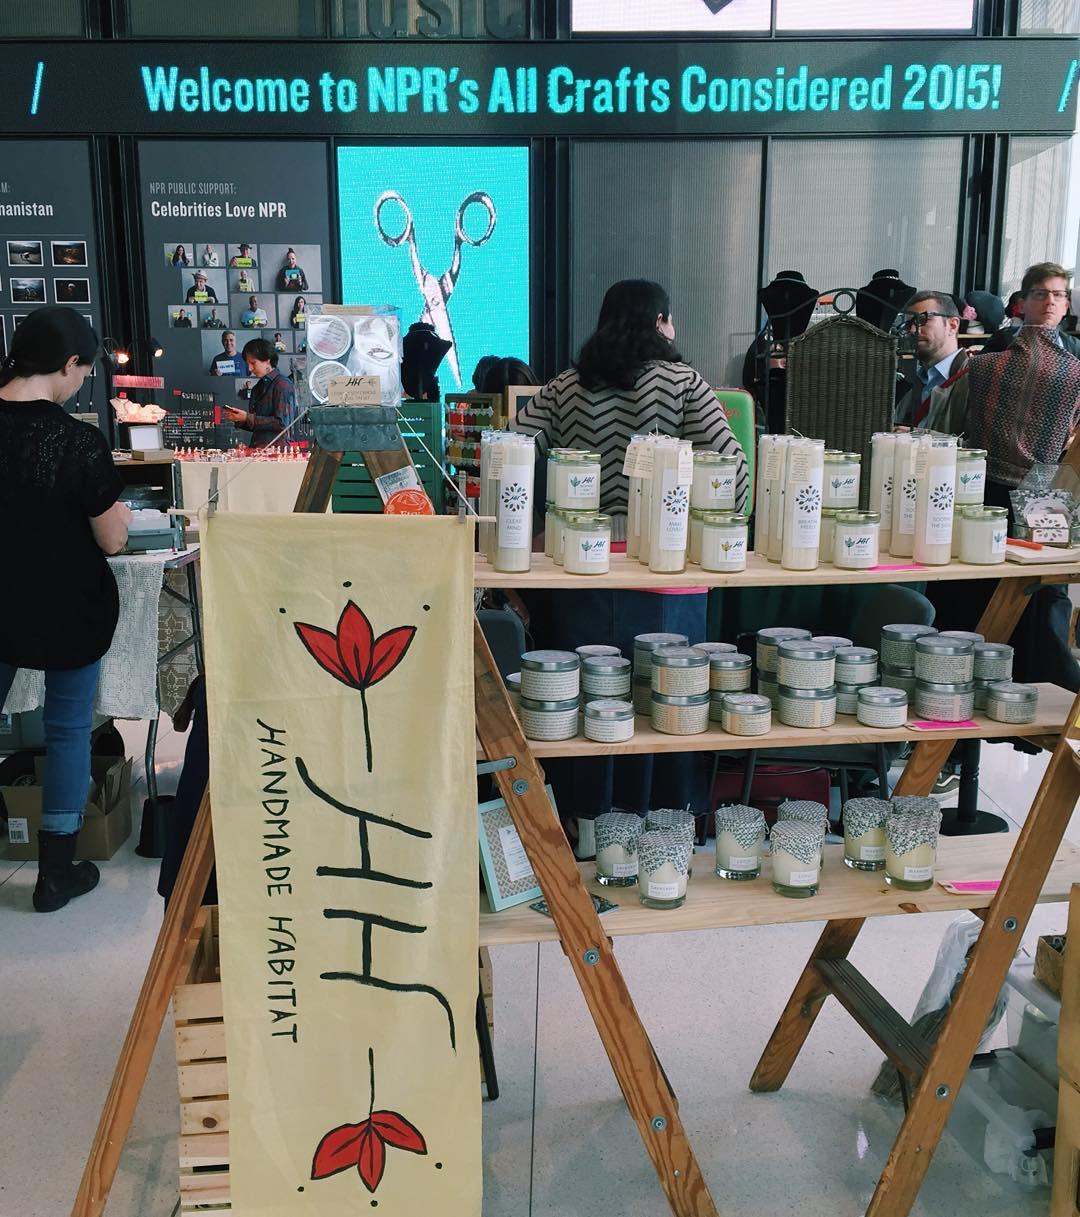 HH at NPR's All Crafts Considered Nov 2015